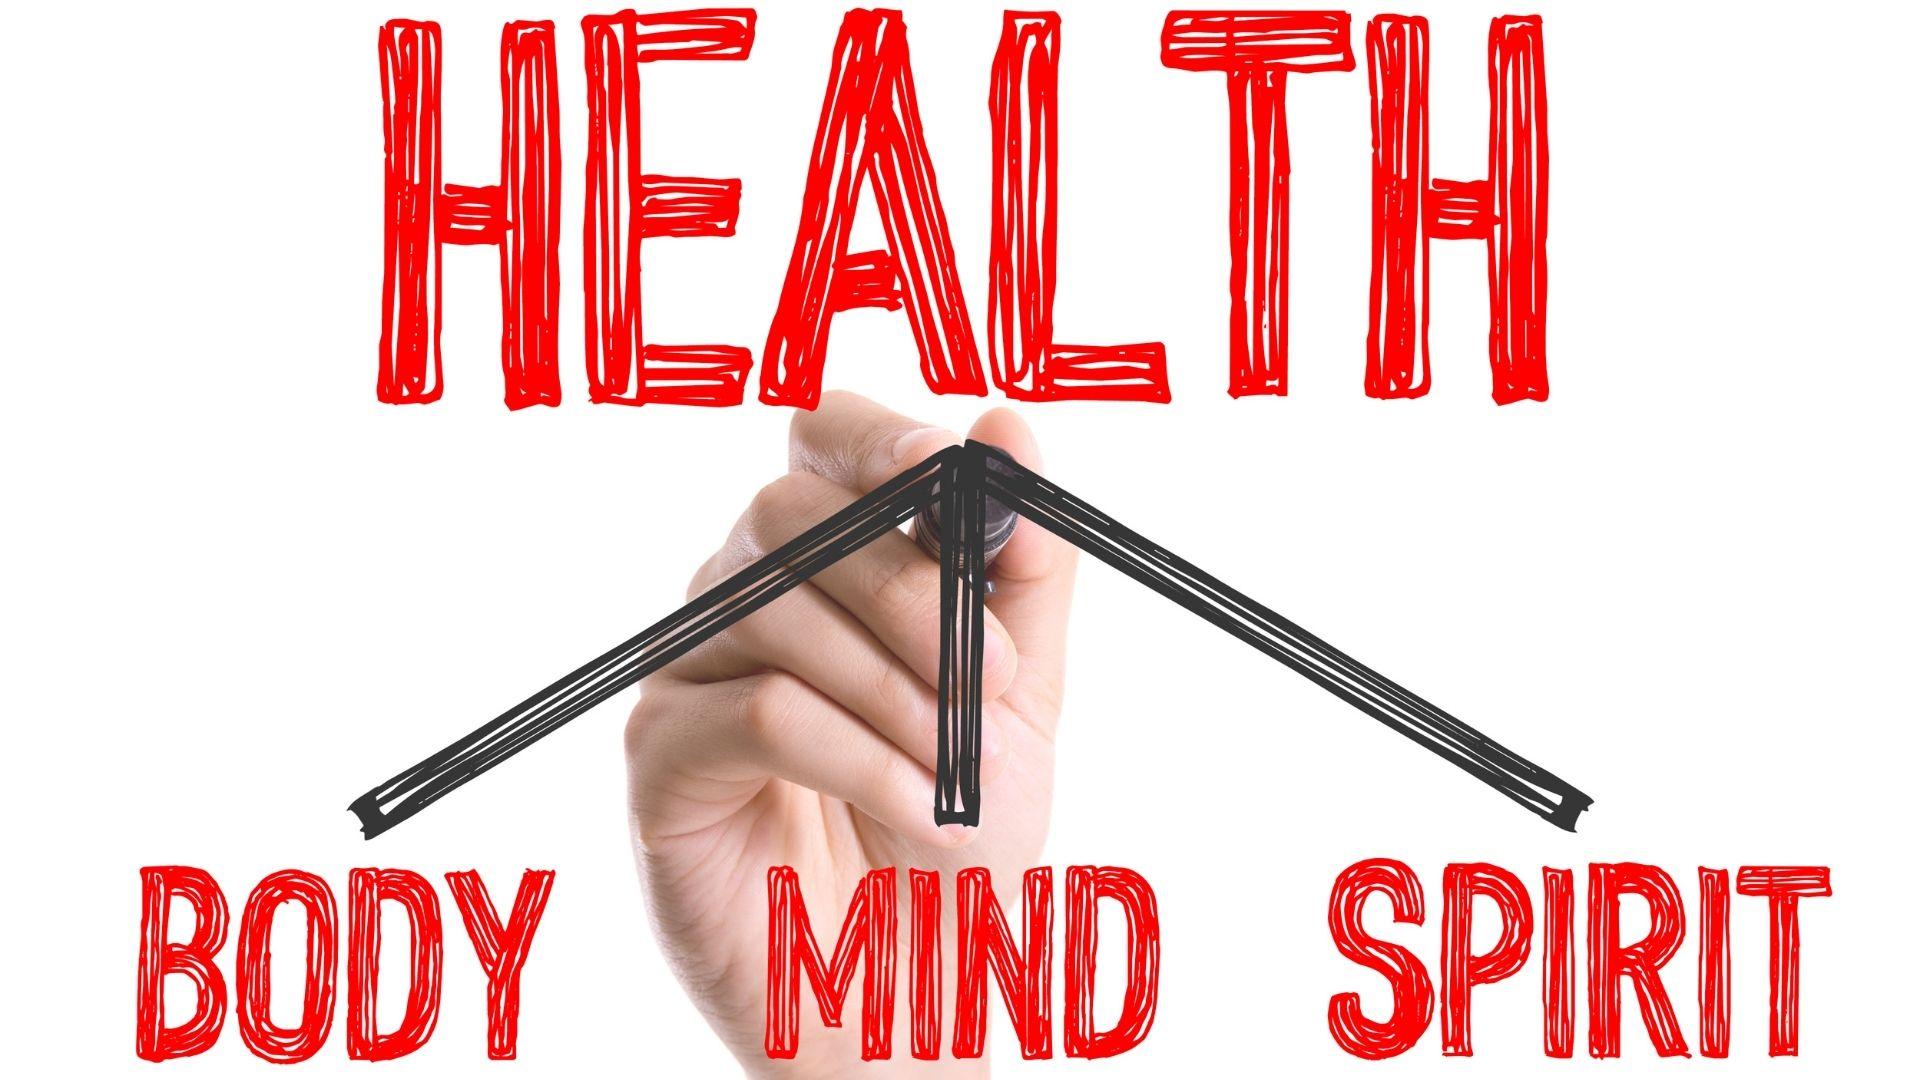 mind body spirit - More mind-body-emotion articles